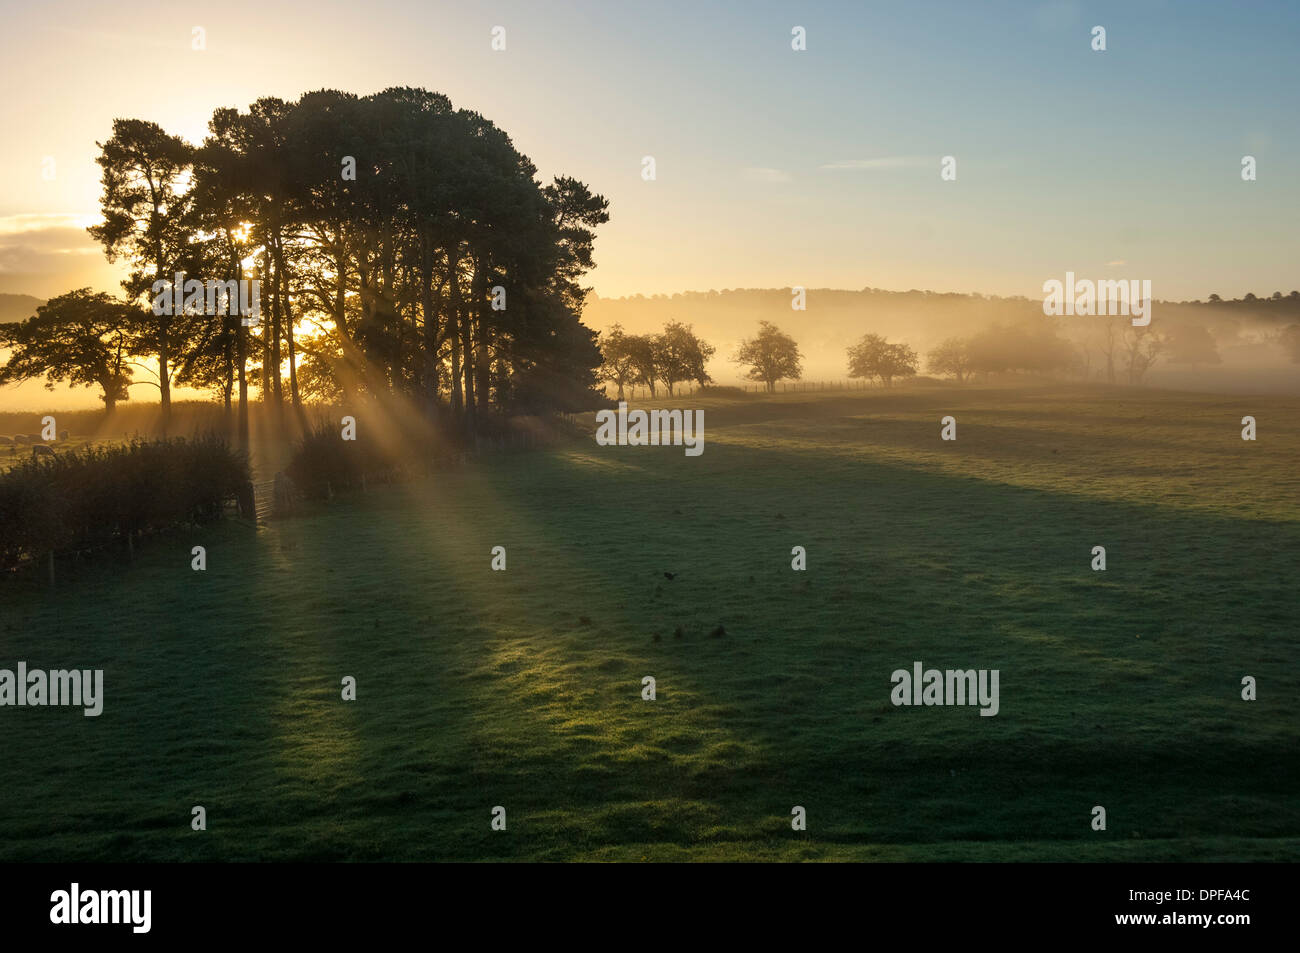 Early morning by Eden Bridge, Eden Valley, Cumbria, England, United Kingdom, Europe - Stock Image